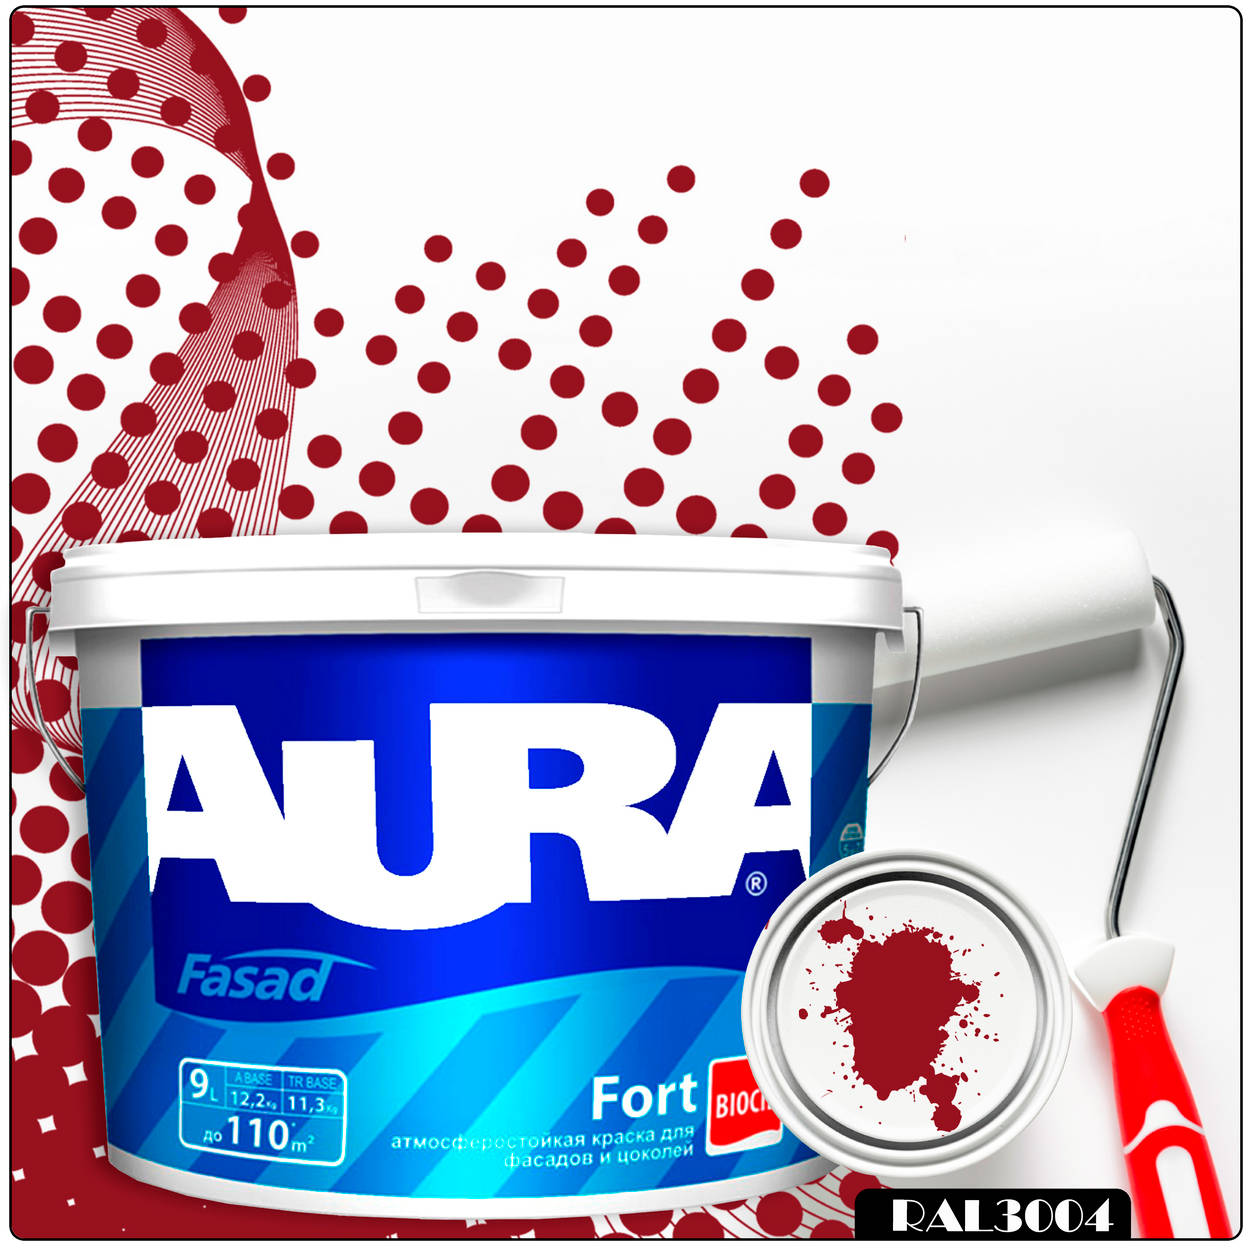 Фото 5 - Краска Aura Fasad Fort, RAL 3004 Пурпурно-красный, латексная, матовая, для фасада и цоколей, 9л, Аура.